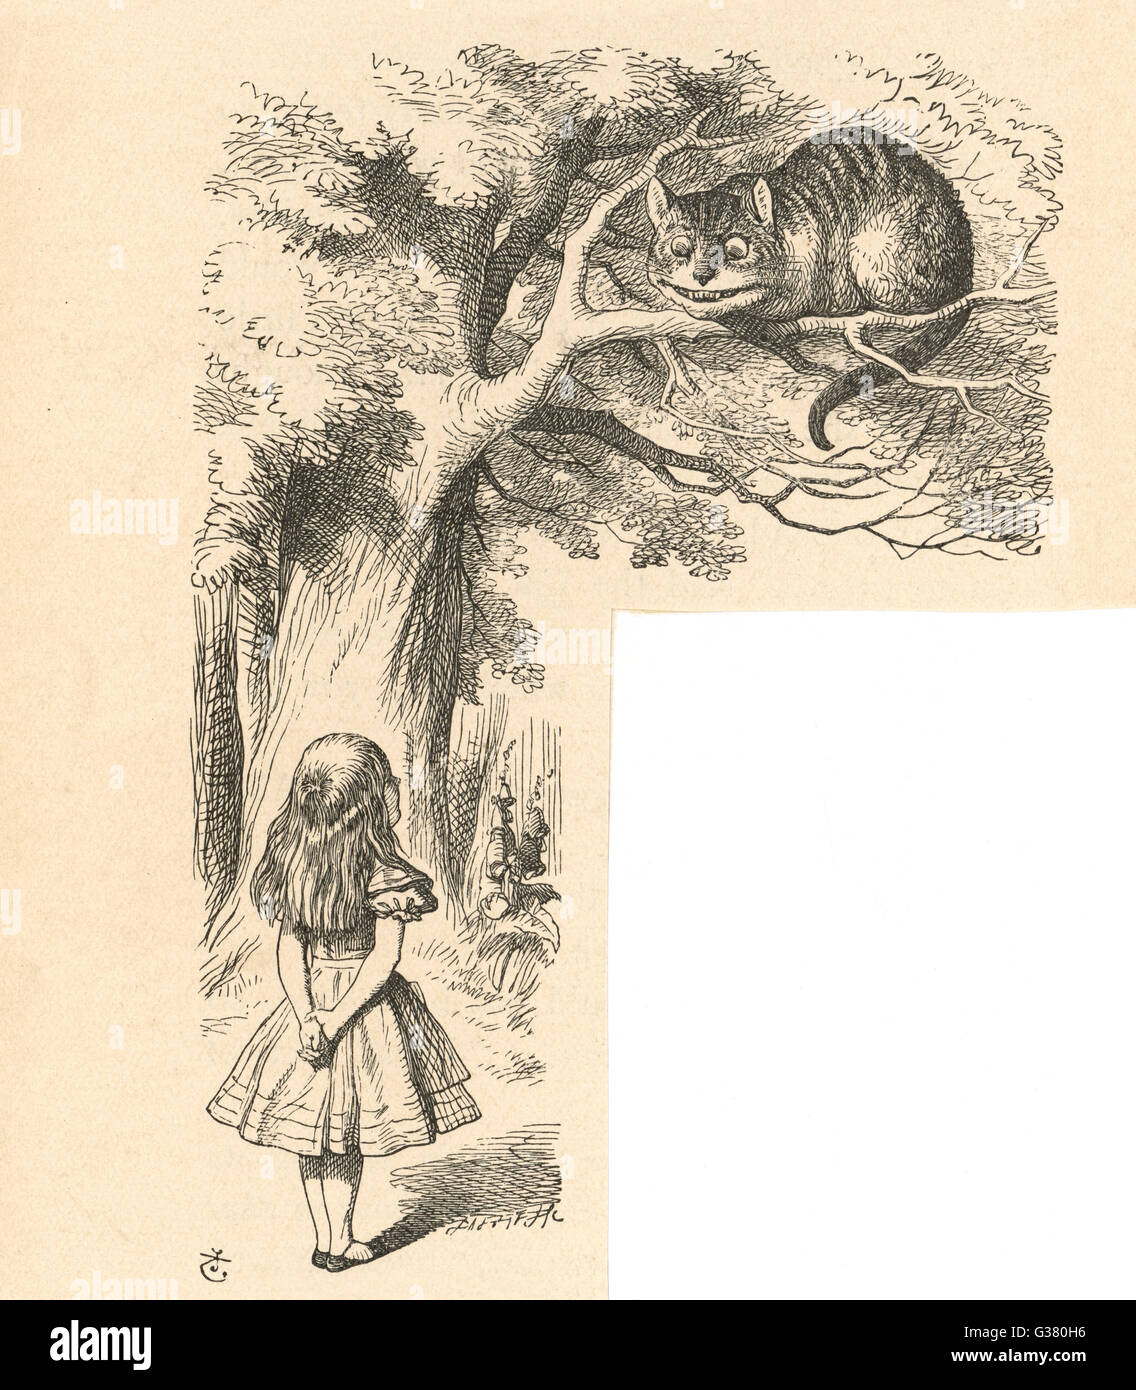 Cheshire Cat Alice Imágenes De Stock & Cheshire Cat Alice Fotos De ...